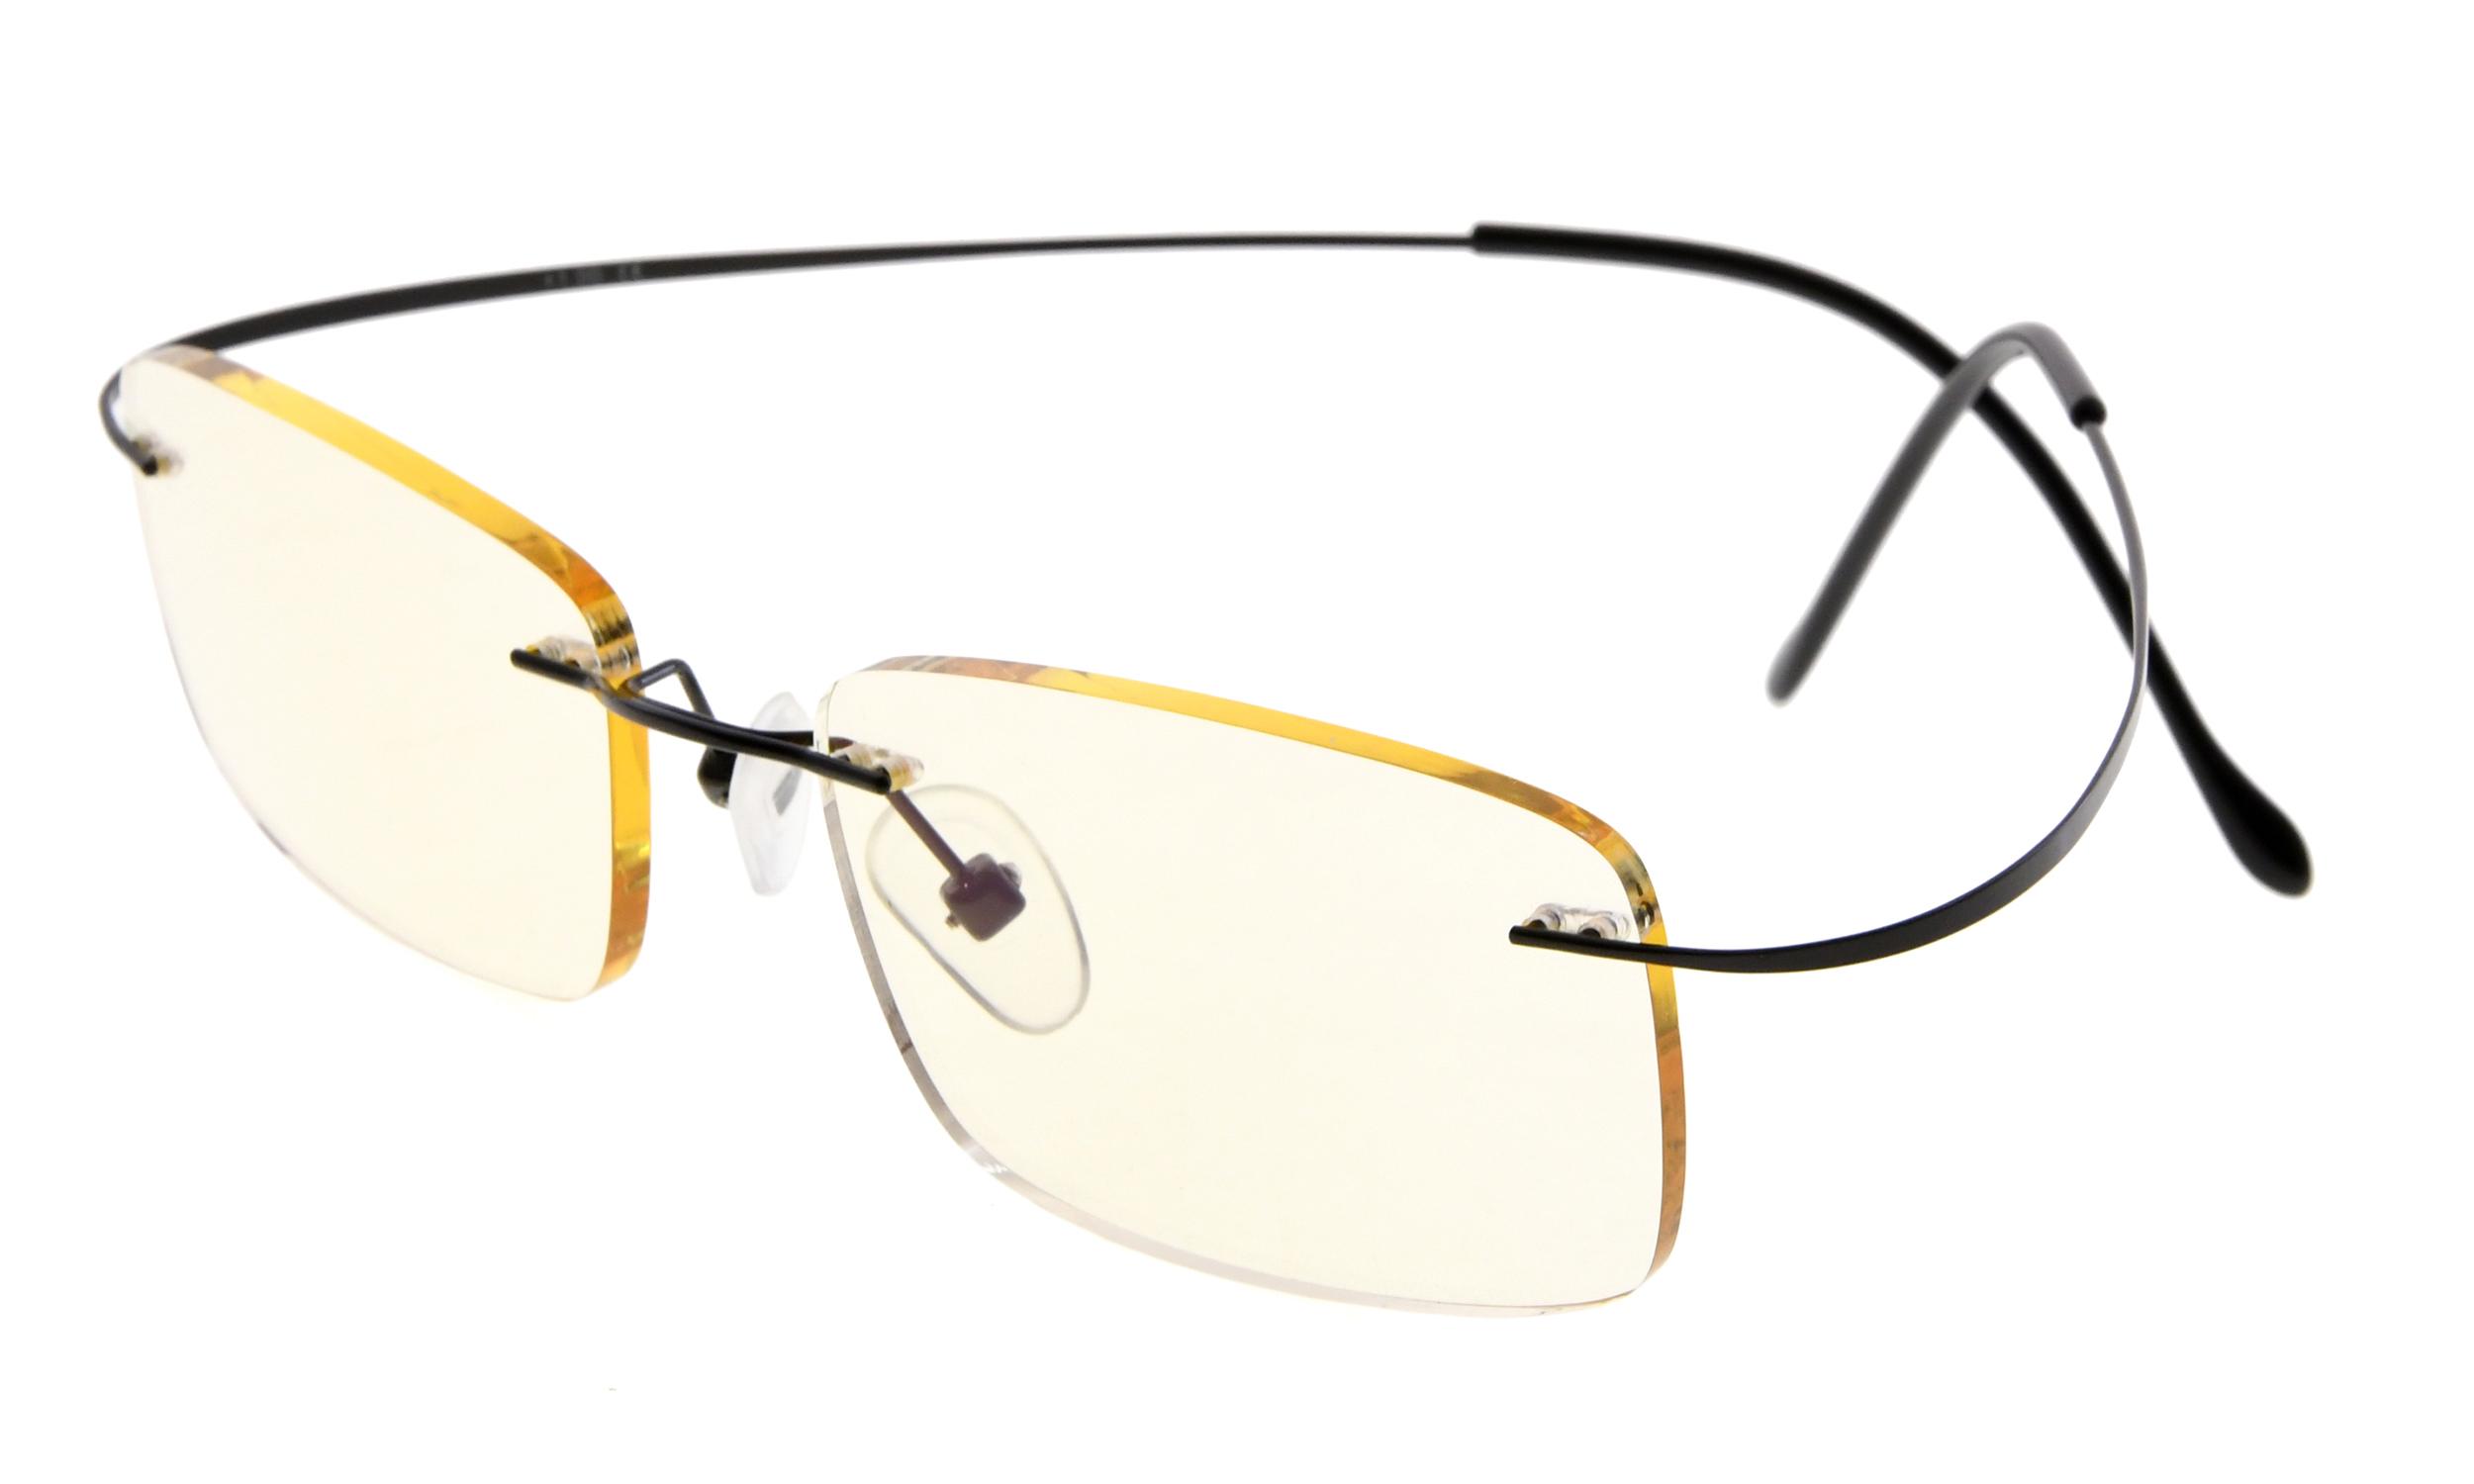 1534c7790dae Eyekepper Computer Reading Glasses UV Protection Titanium Rimless Stylish Readers  Women Men Black CG1508